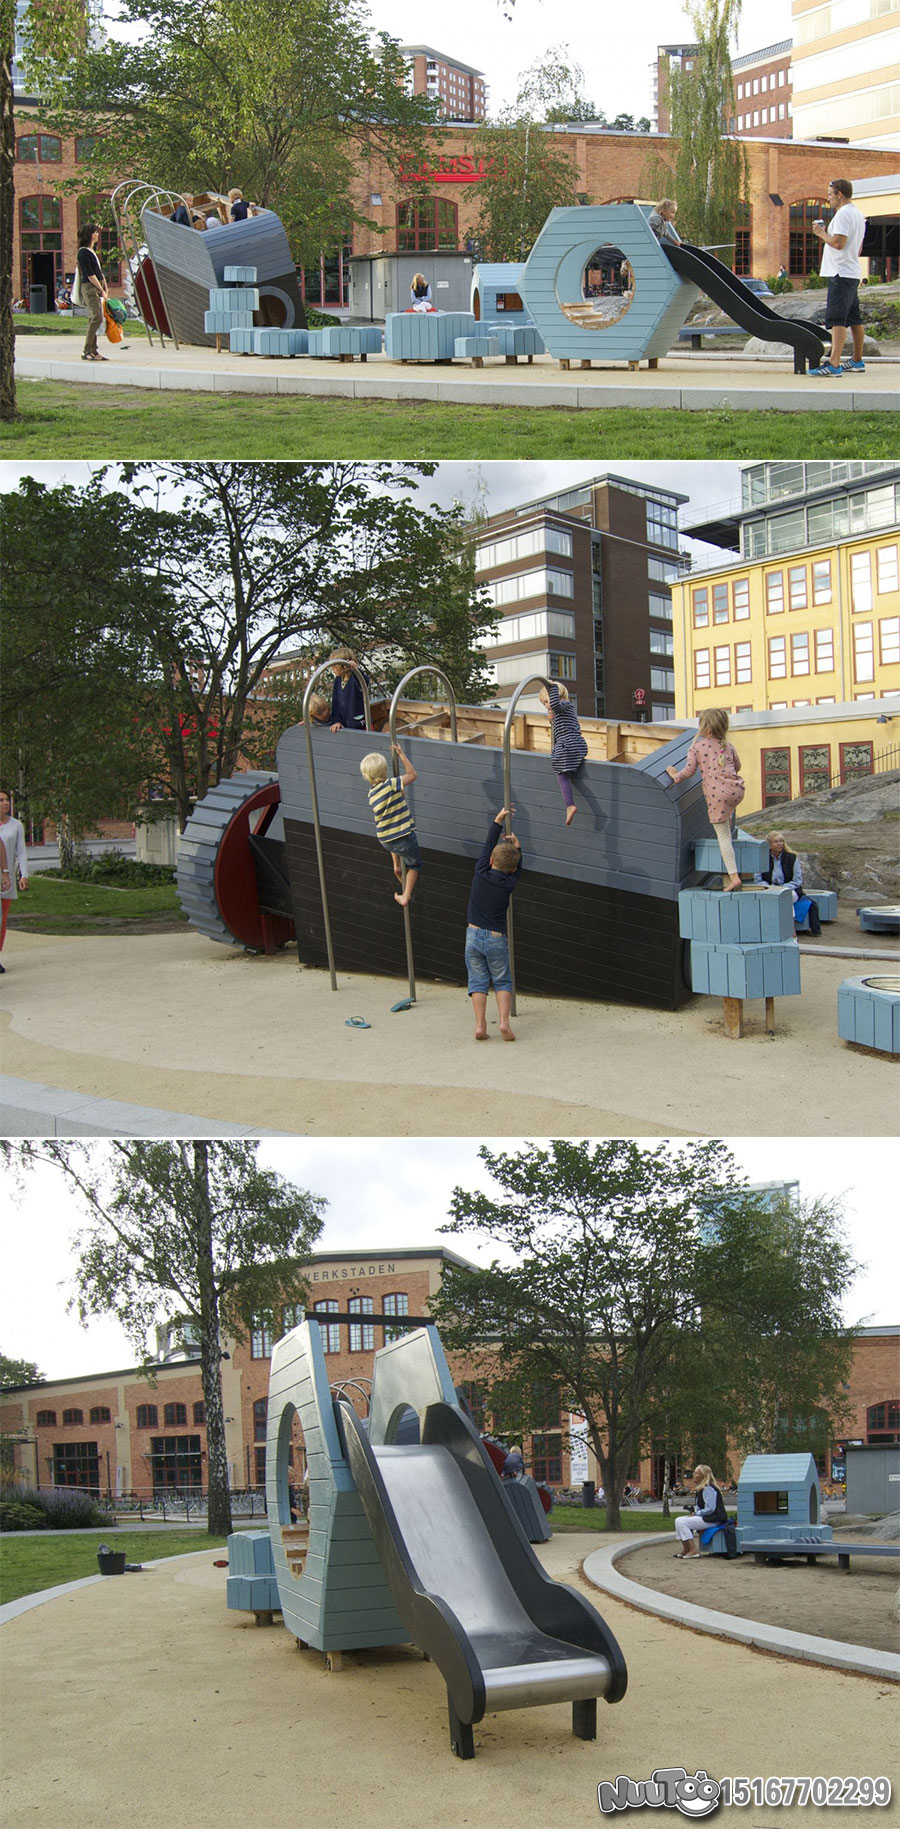 Non-standard amusement + personalized playground + amusement equipment + rides + outdoor children's play facilities _15